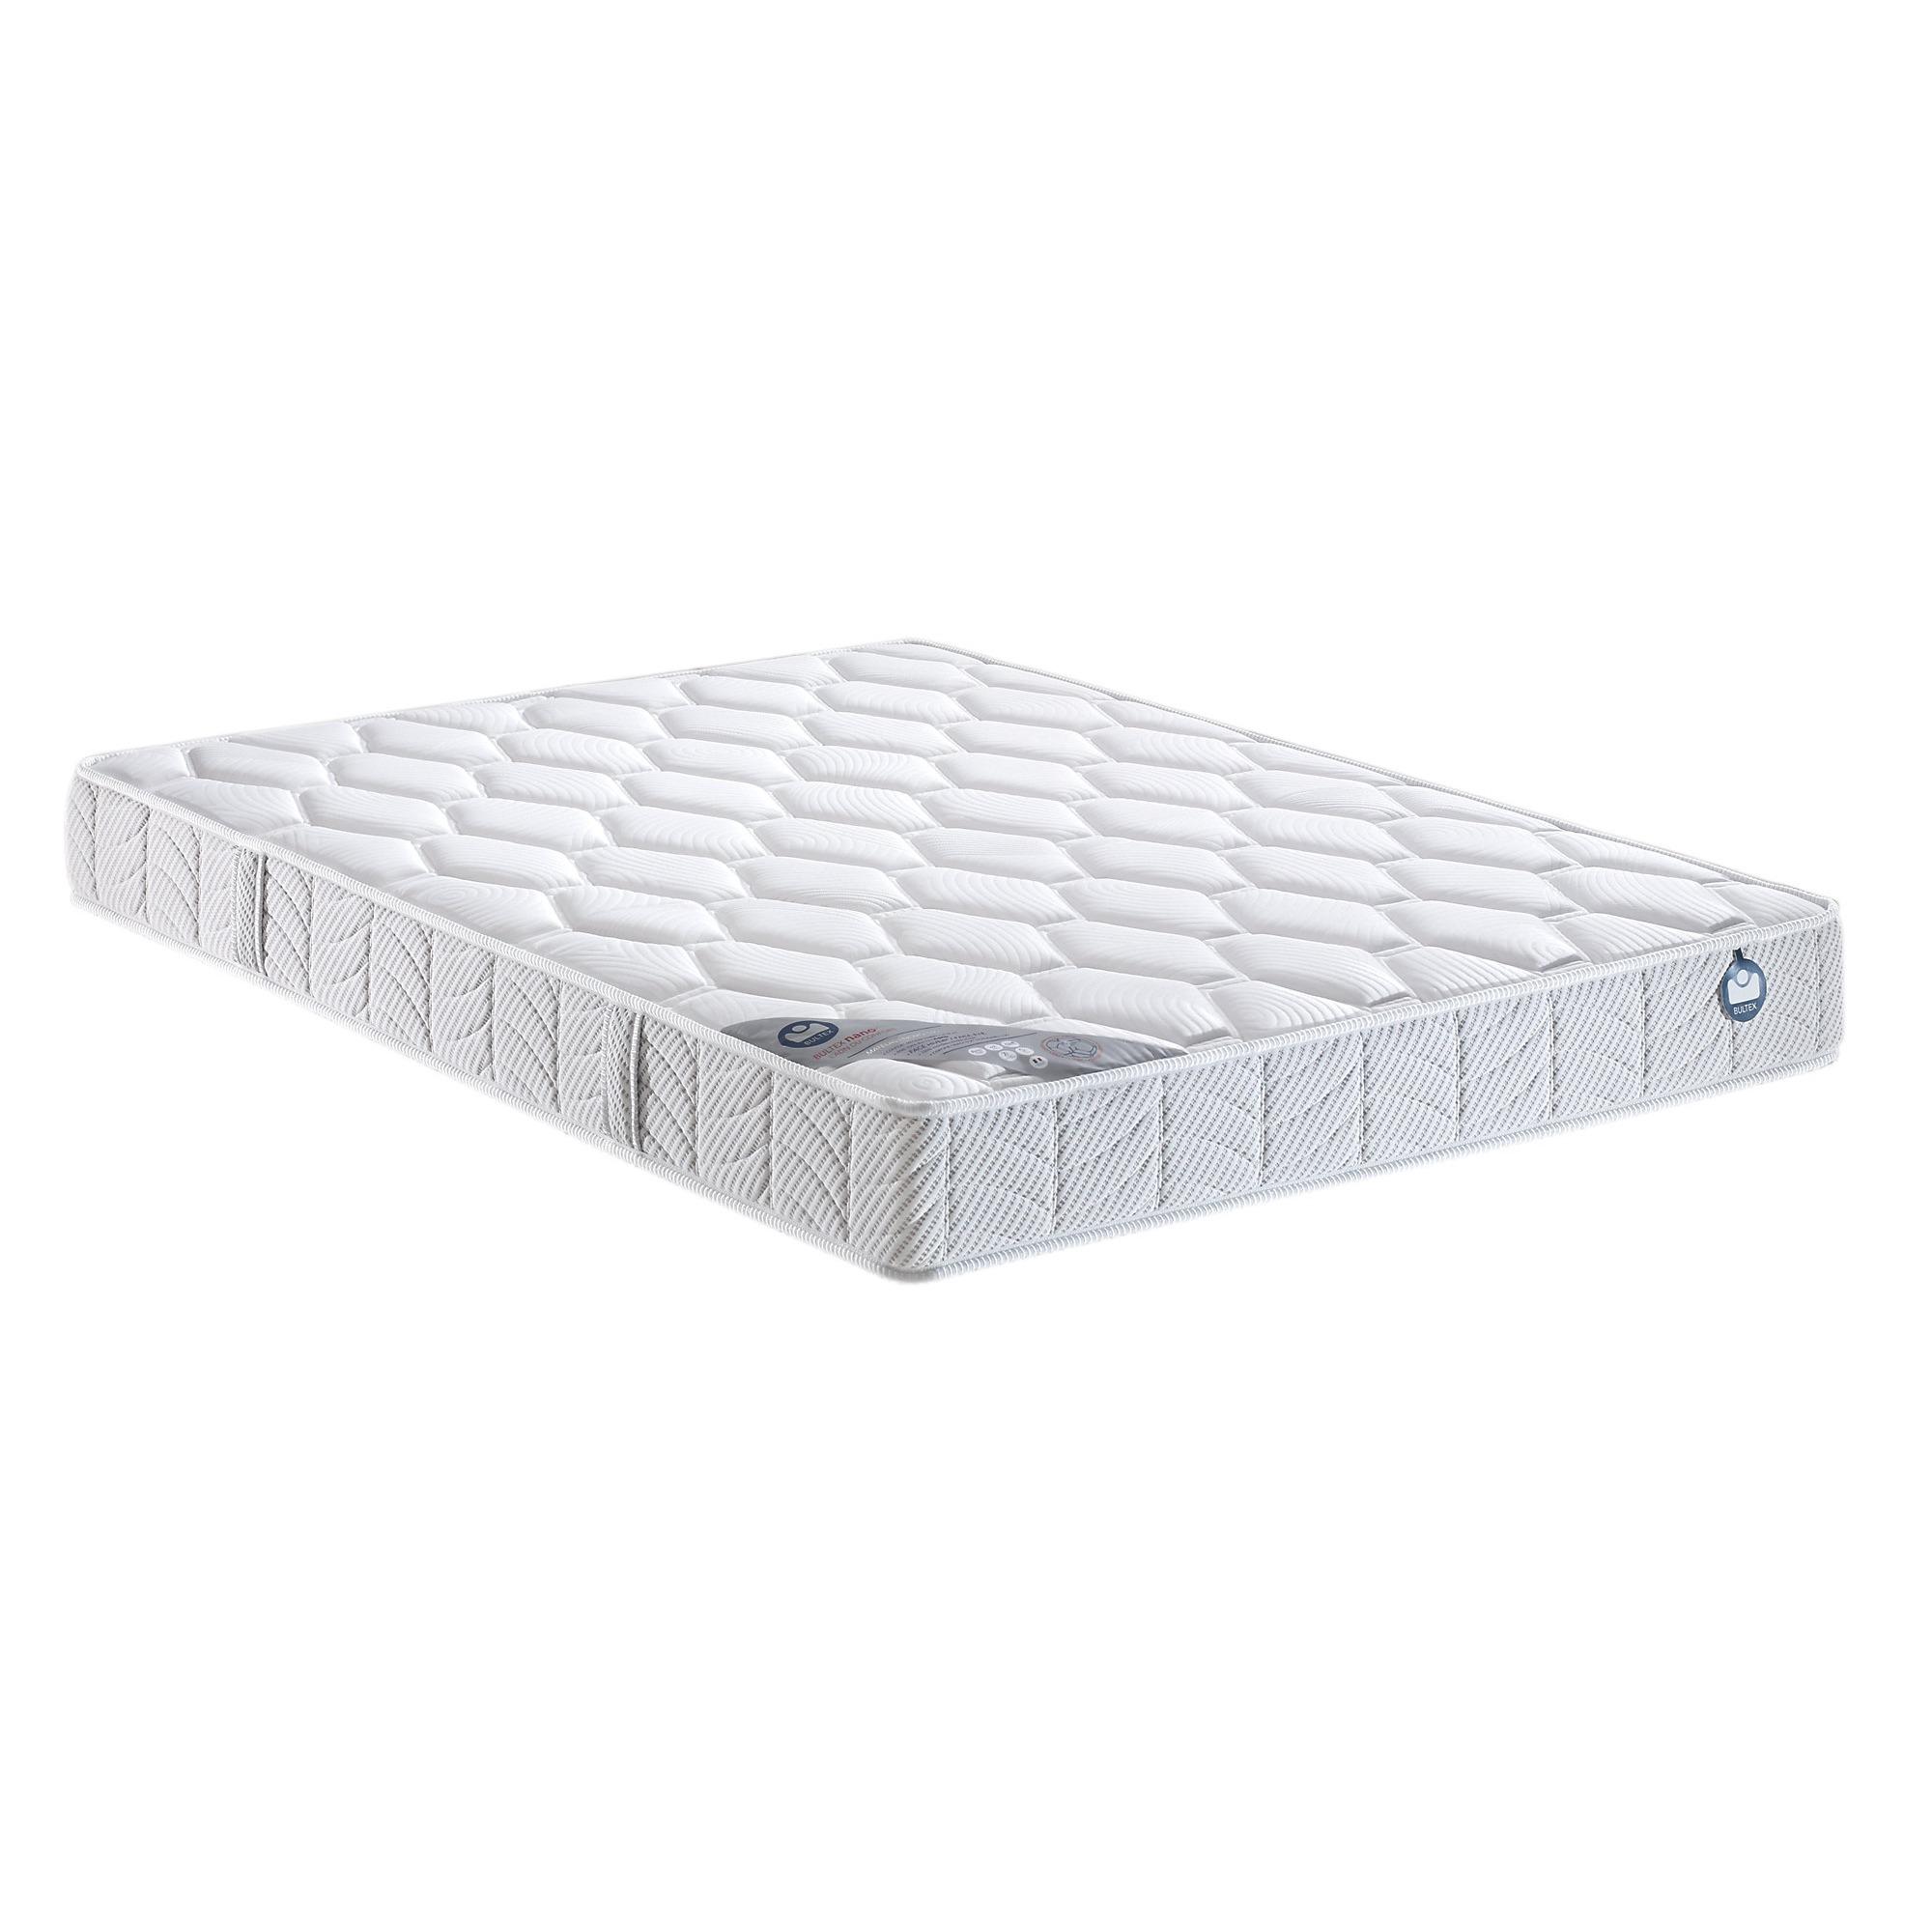 bultex i novo 100 matelas en mousse 160 x 200 cm comparer avec. Black Bedroom Furniture Sets. Home Design Ideas